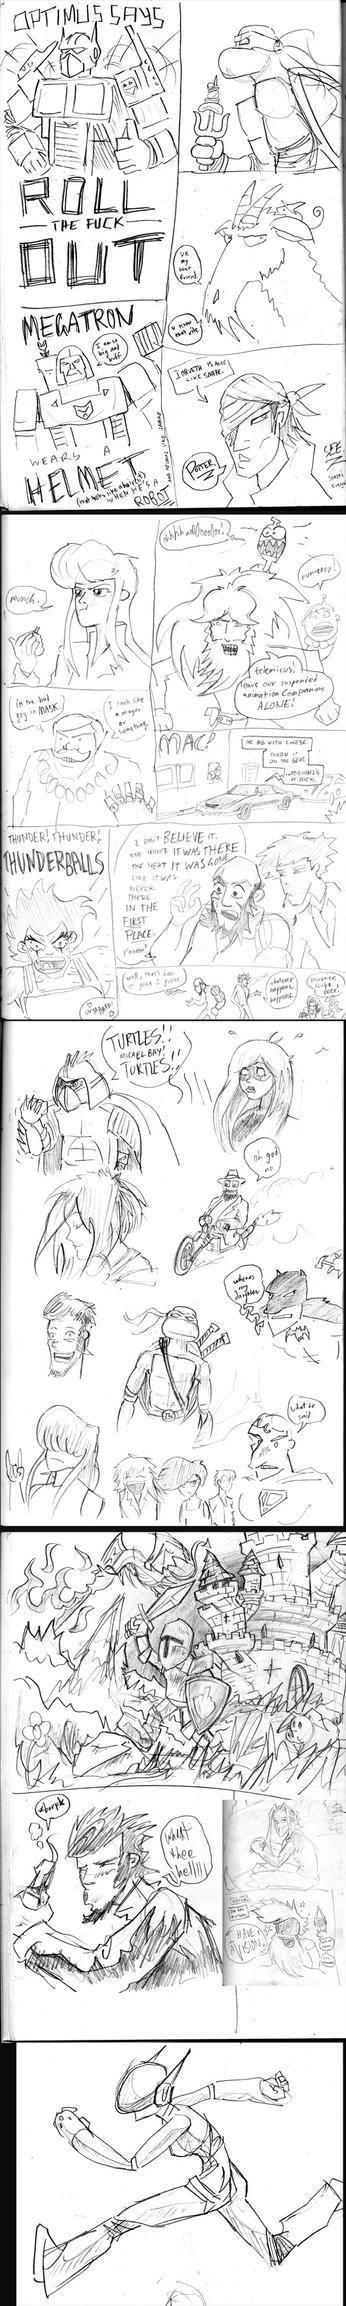 Drunken Sketchbook 2 by dogtopus